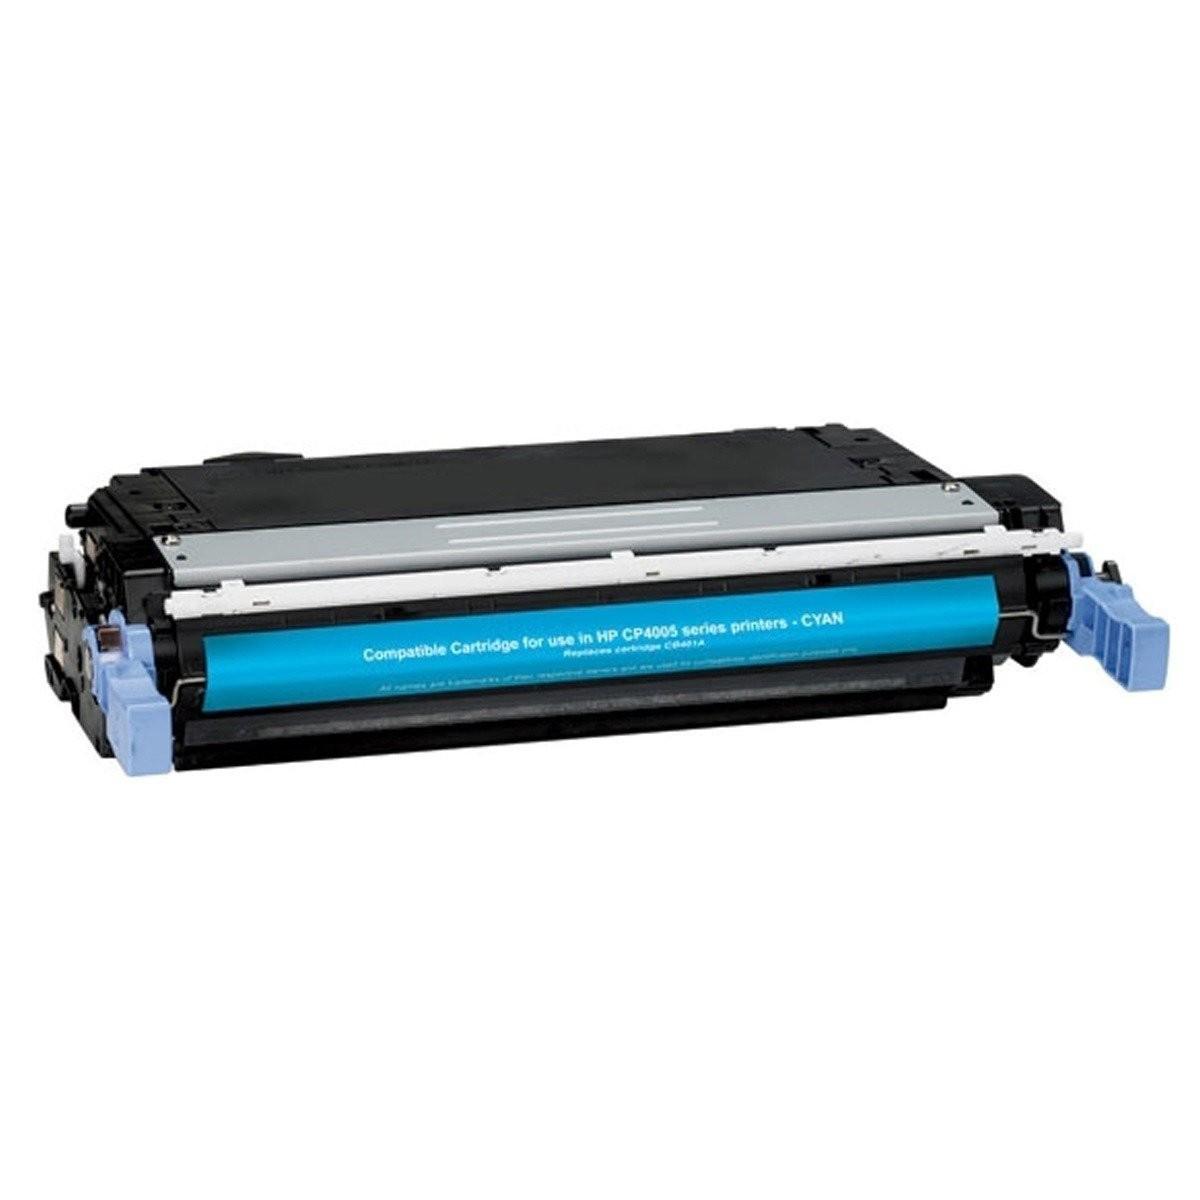 Image of   HP CB401A C (HP 642A) Lasertoner,Cyan.Kompatibel,7500 sider